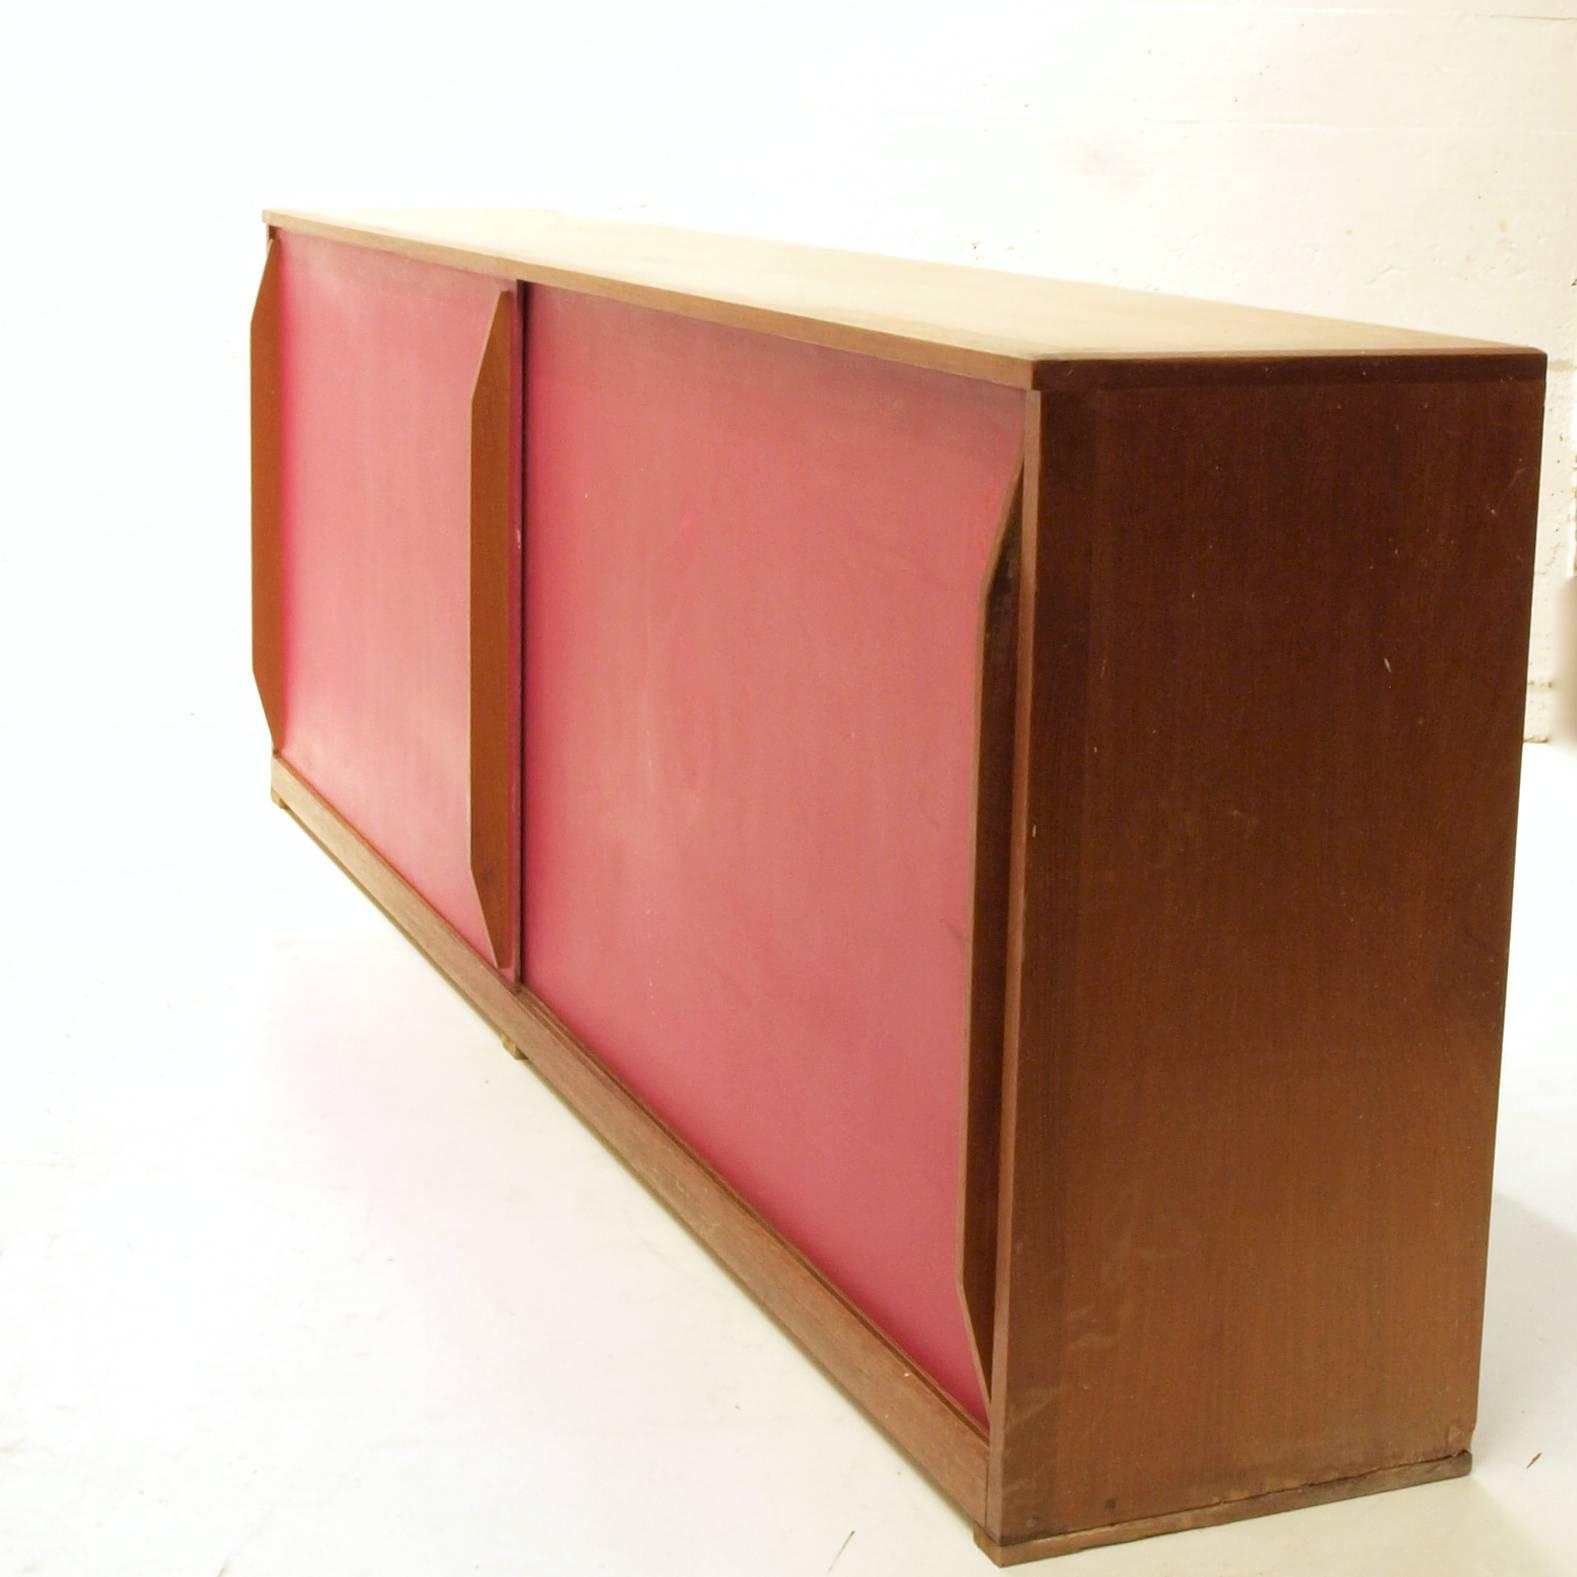 langes schiebeschrank sideboard jetzt in blau frisch lackiert m bel z rich vintagem bel. Black Bedroom Furniture Sets. Home Design Ideas